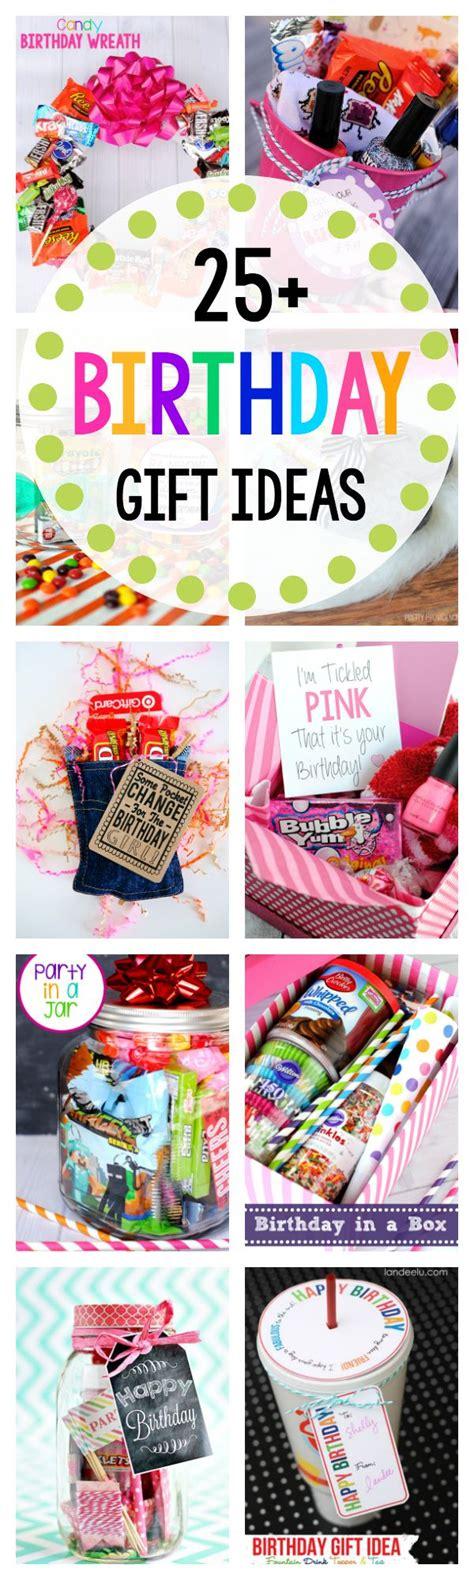 Handmade Gift Ideas For Friends Birthday - best 25 birthday gifts ideas on present ideas